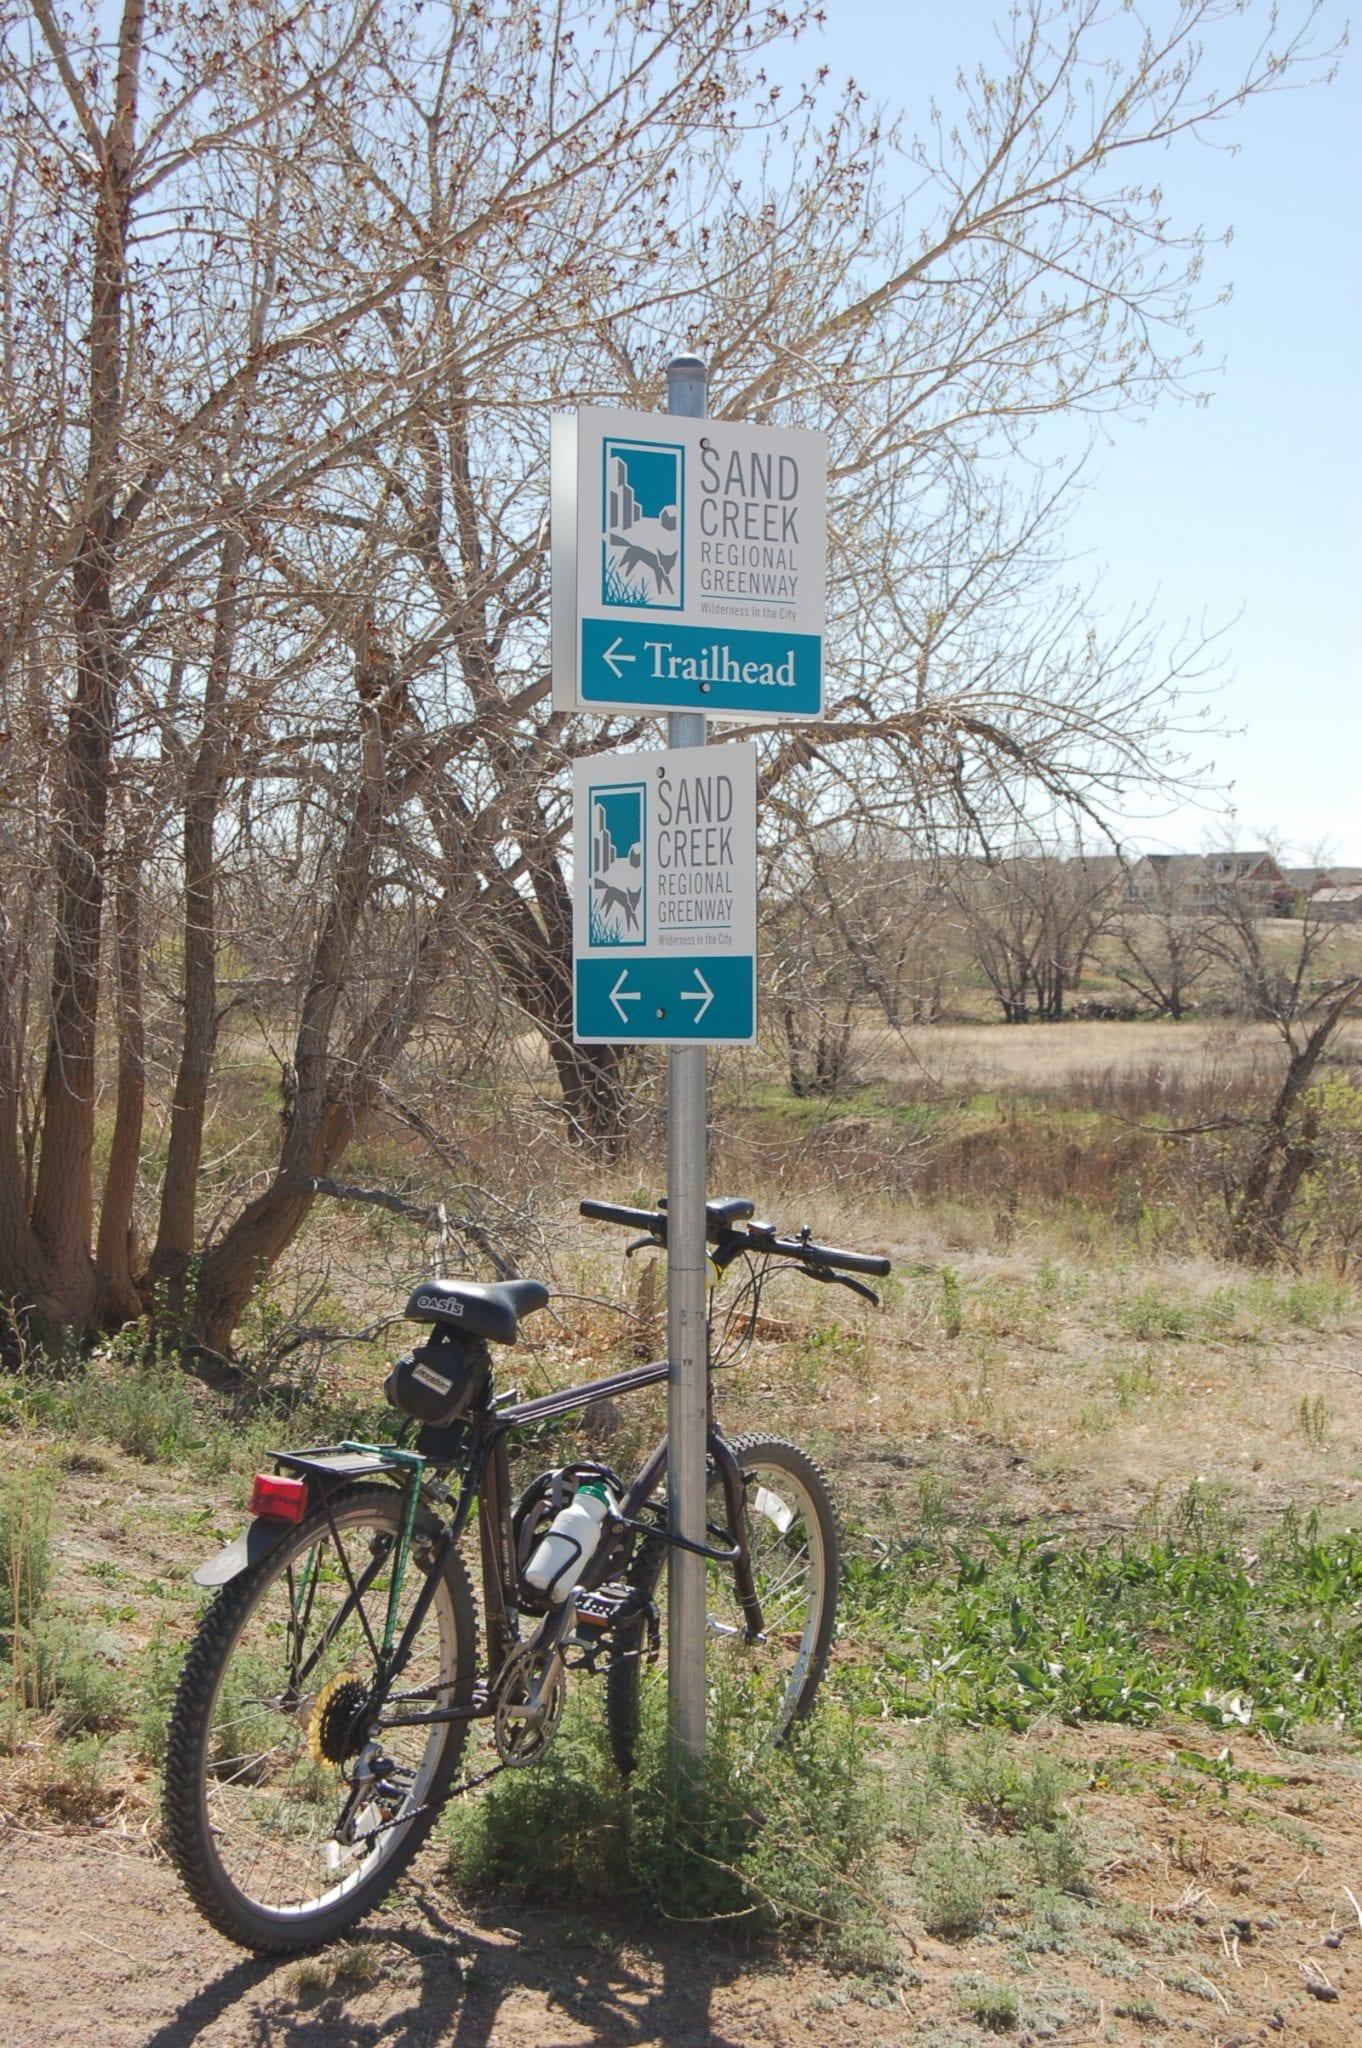 Sand Creek Regional Greenway Trail Map Colorado